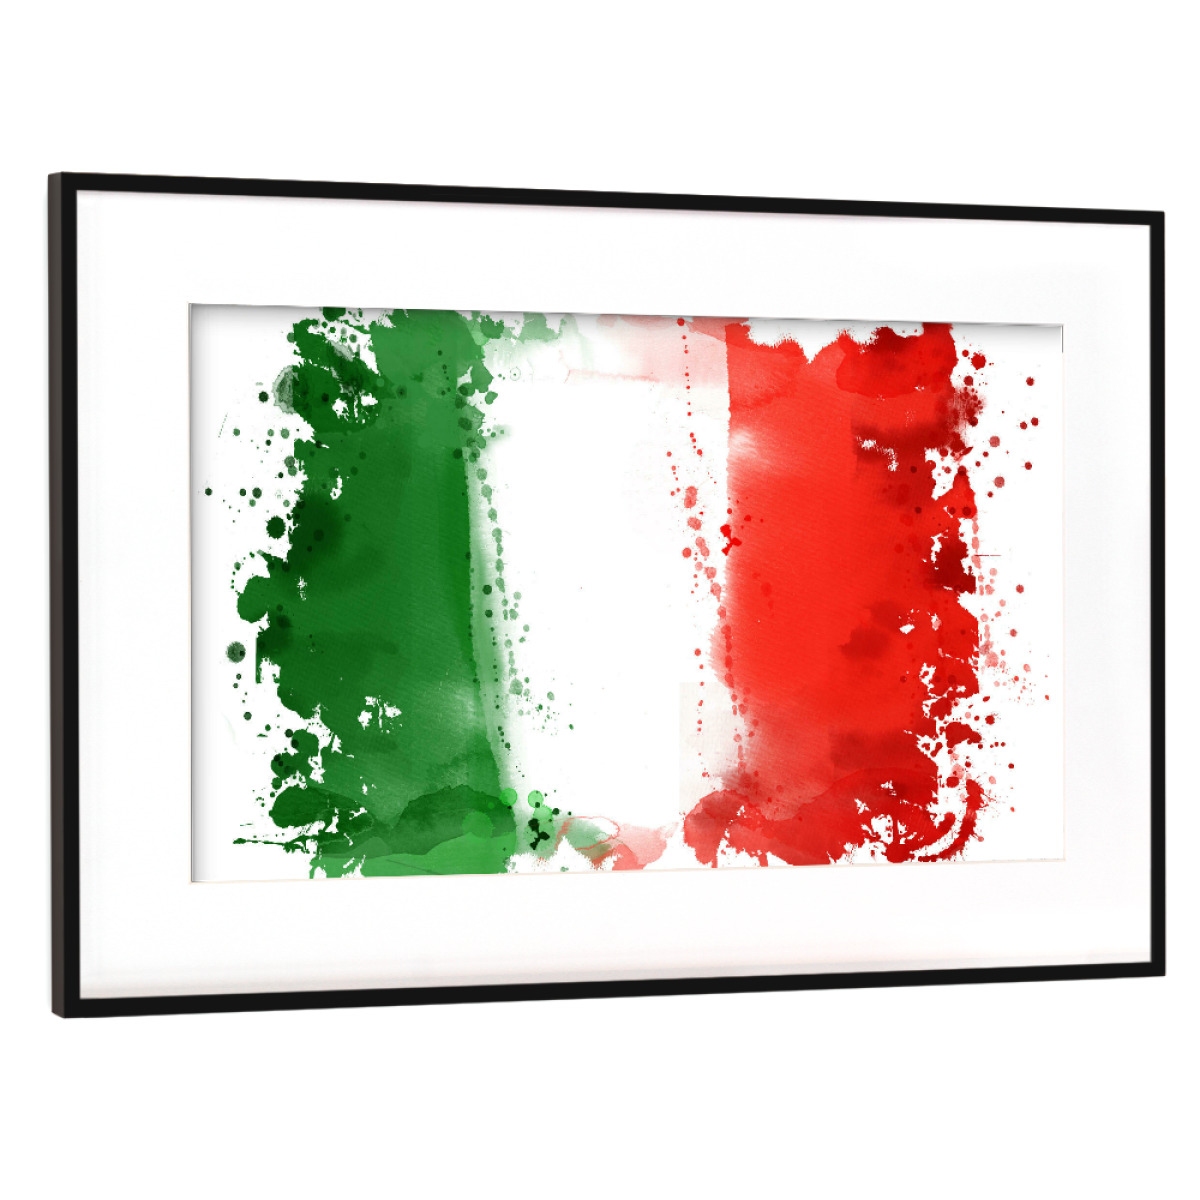 Flagge Italien als Gerahmt bei artboxONE kaufen